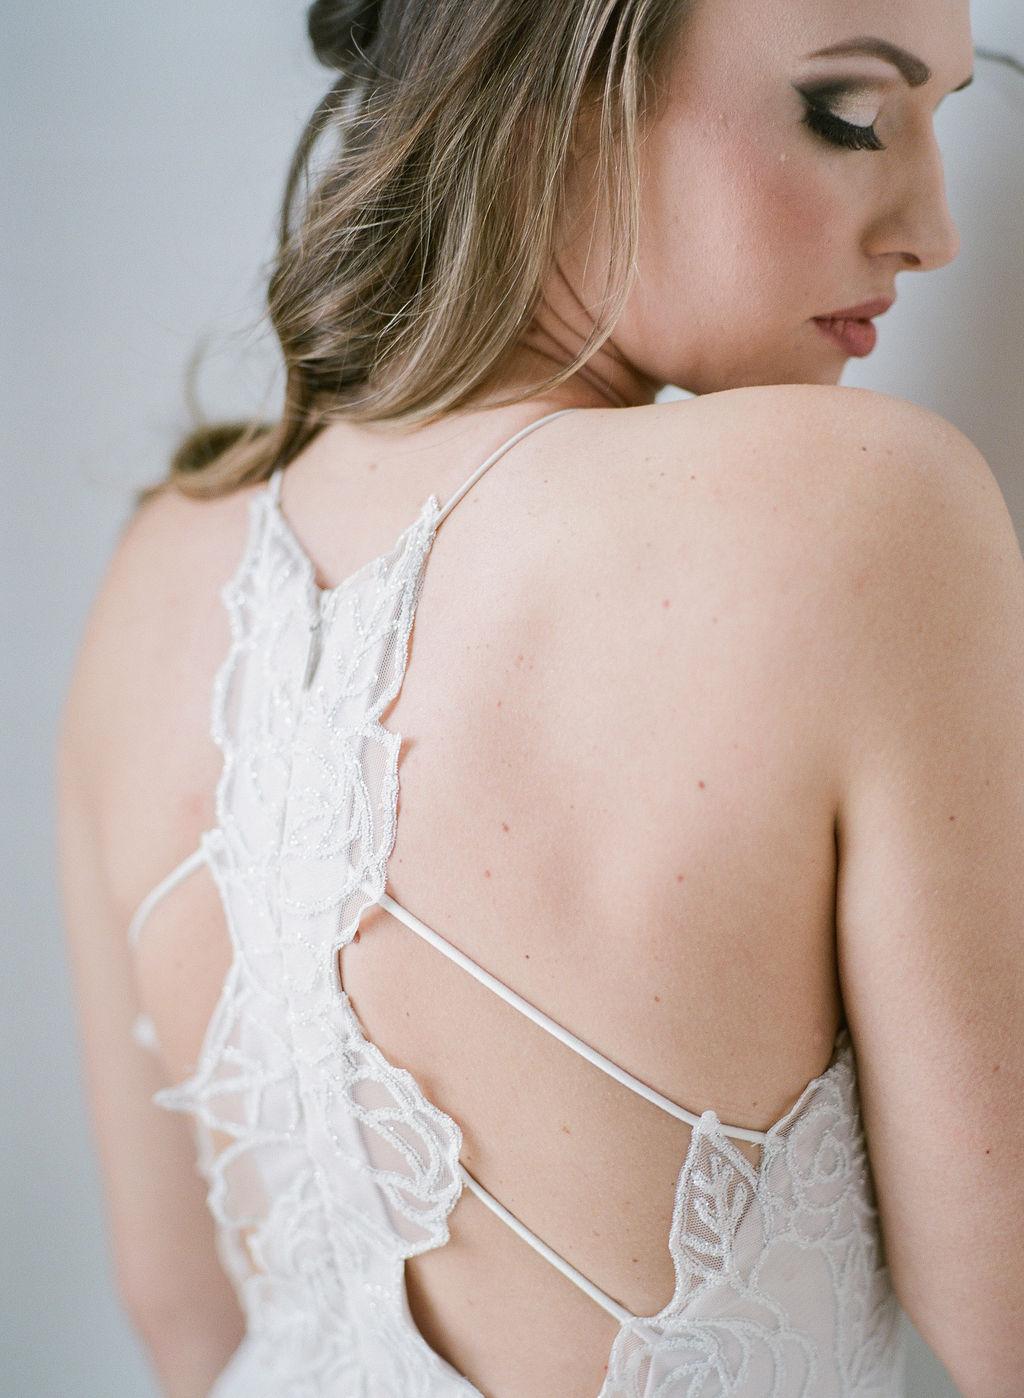 Detail back of wedding dress bride spokane